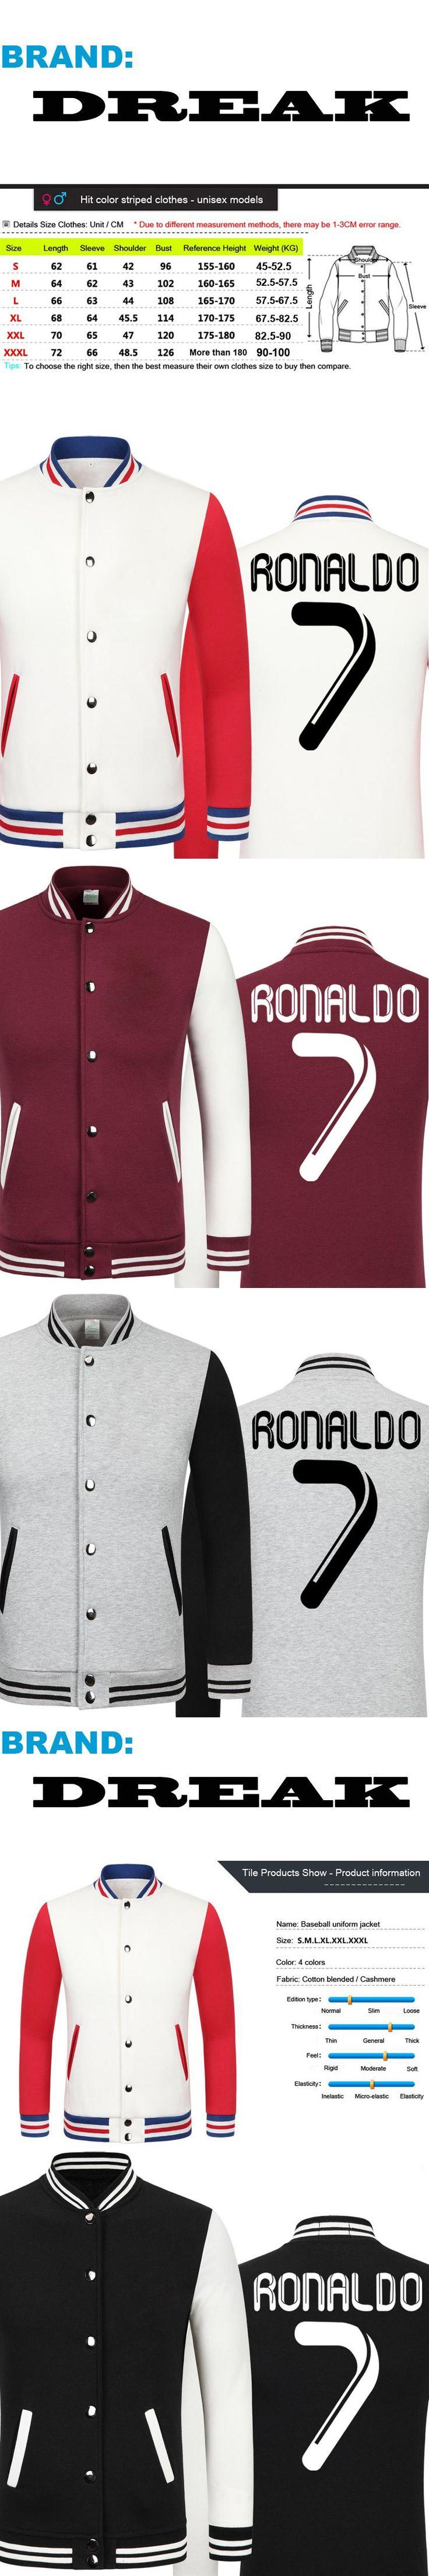 2016 World Cup Cristiano Ronaldo thick velvet baseball uniform men's Jackets camiseta youth jackets barcelonae kids tracksuit